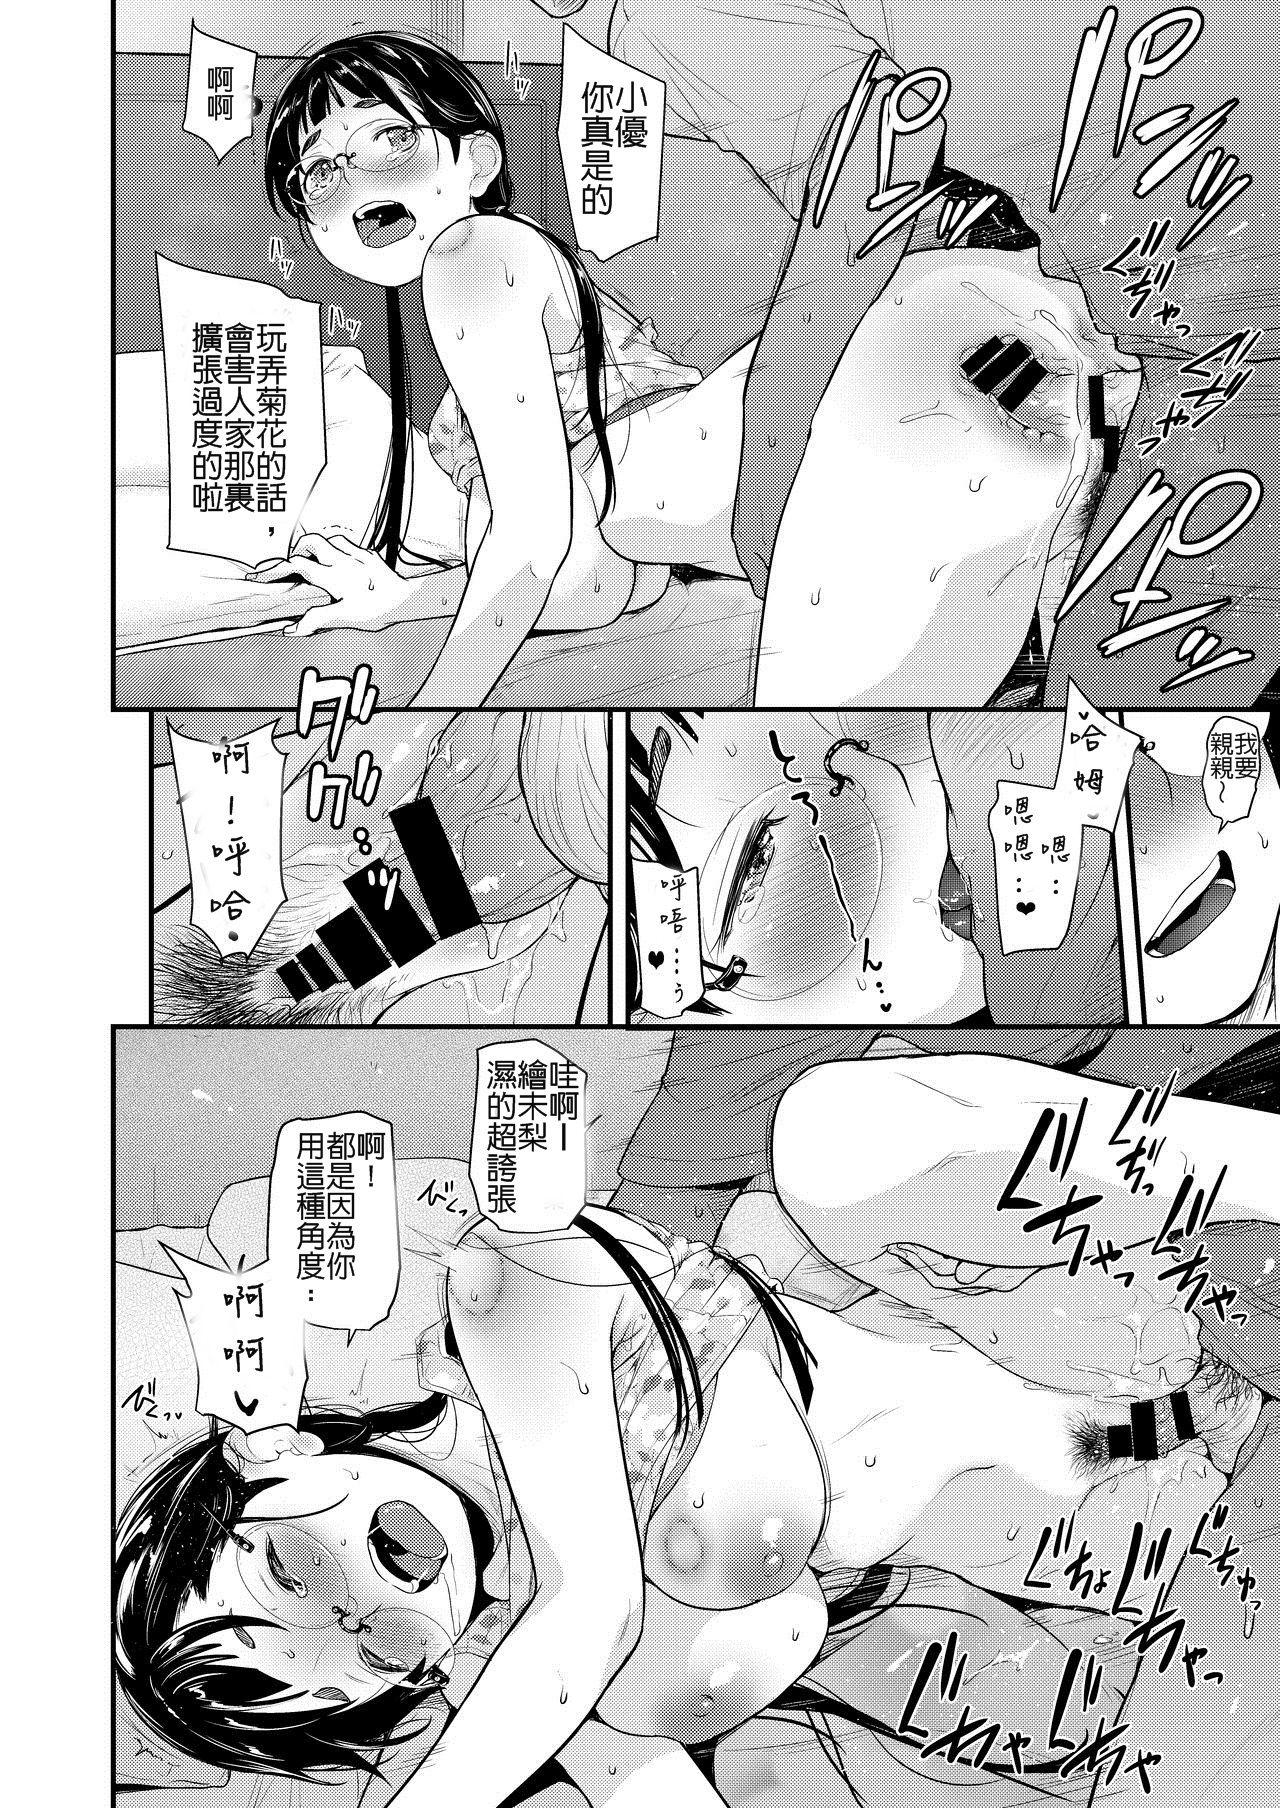 [T.cop (Natsuki Kiyohito)] Jimiko to Ichinichijuu Sex 4 - Futarikiri no Juken Benkyou wa... | 和土妹子搞上一整天-只有兩人的讀書會 [Chinese] [Digital] 25